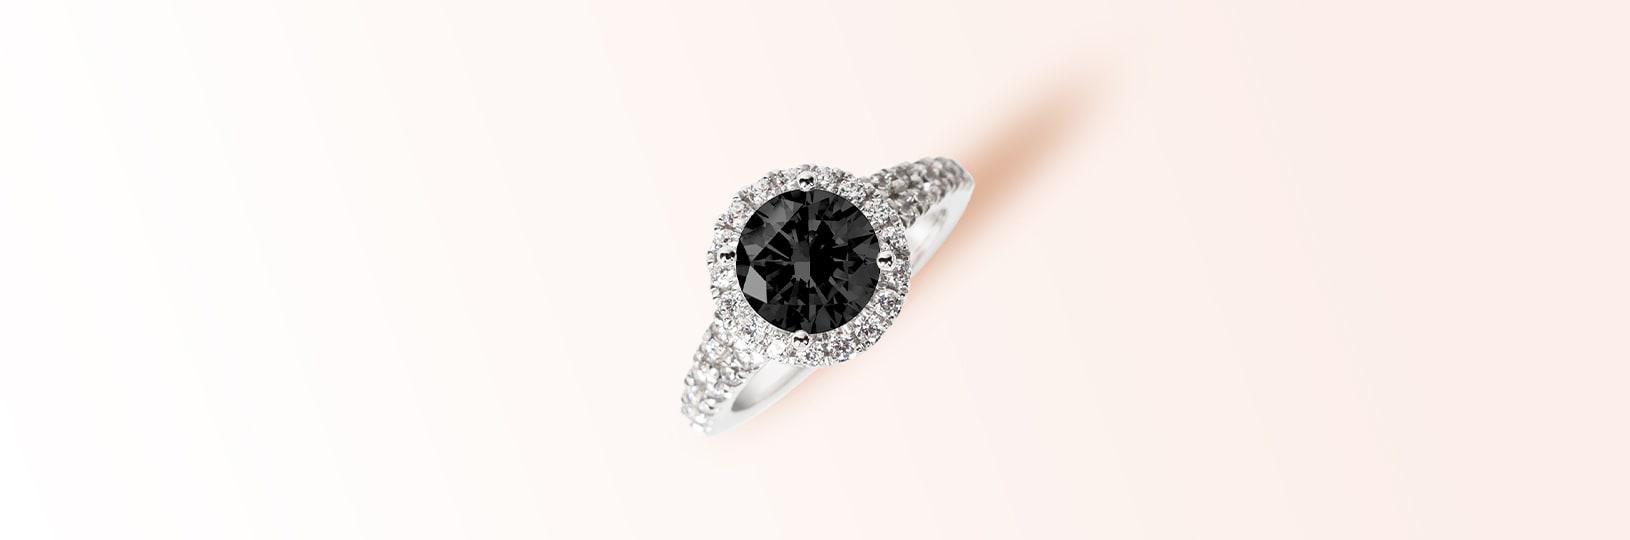 Photo of a black diamond engagement ring.